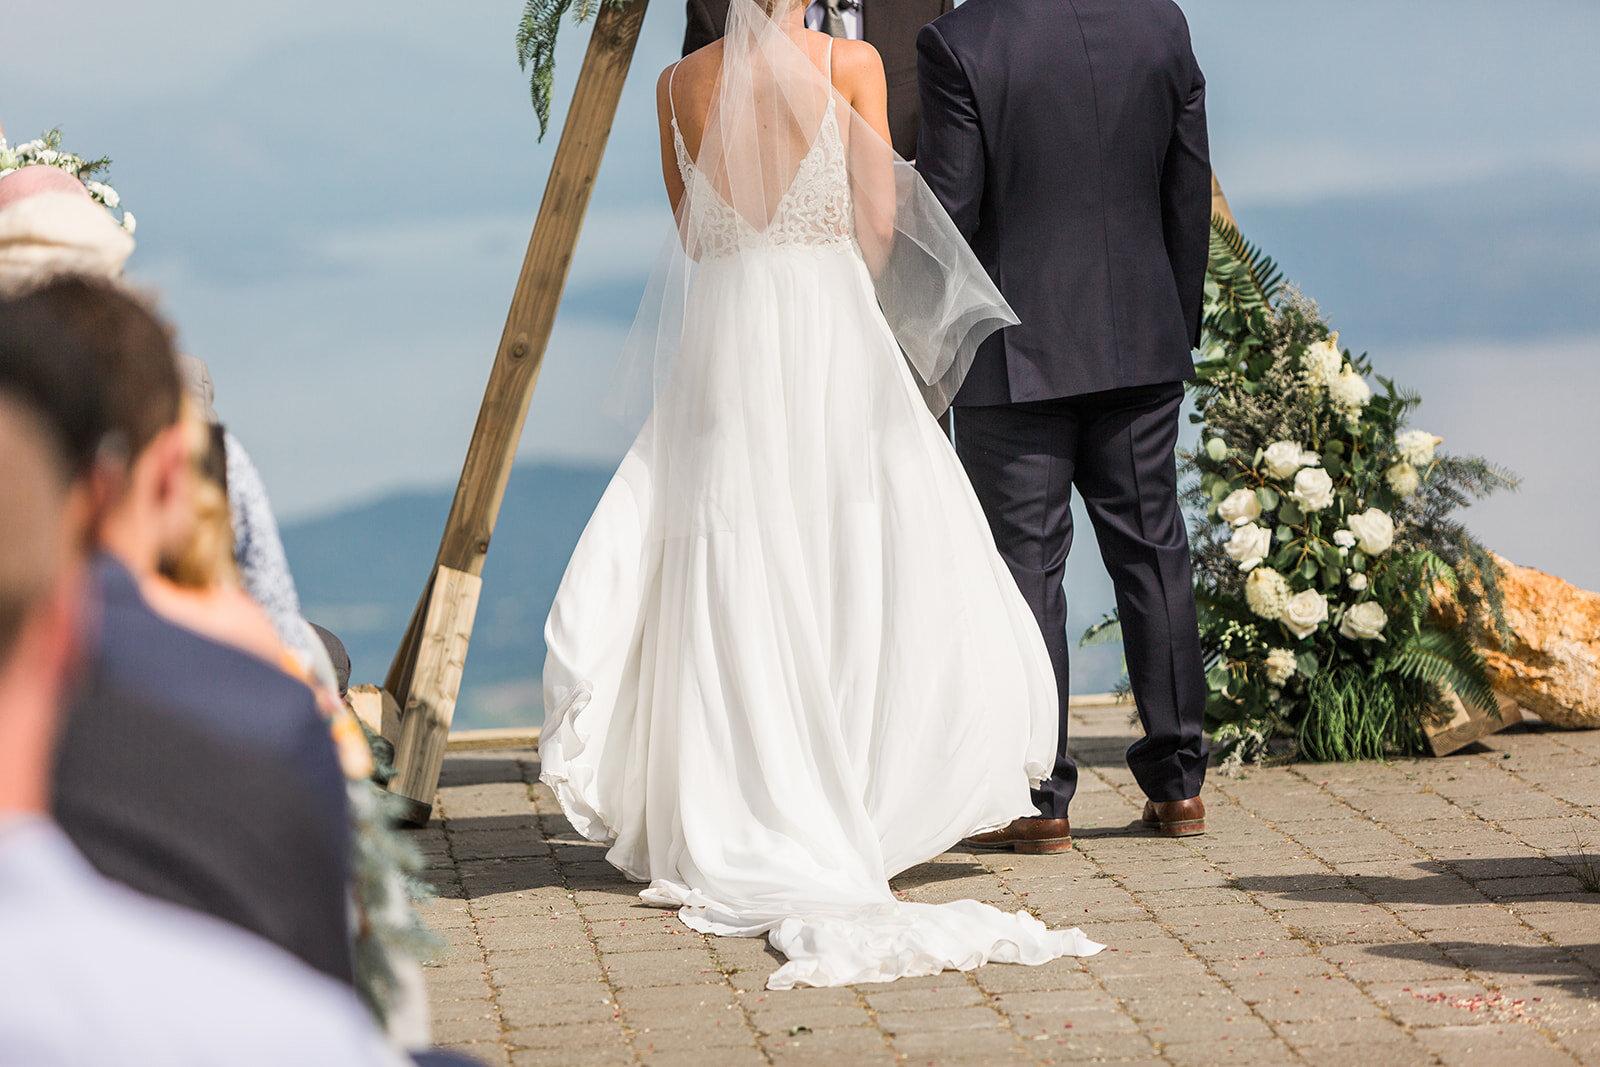 bride and groom ceremony spokane wedding